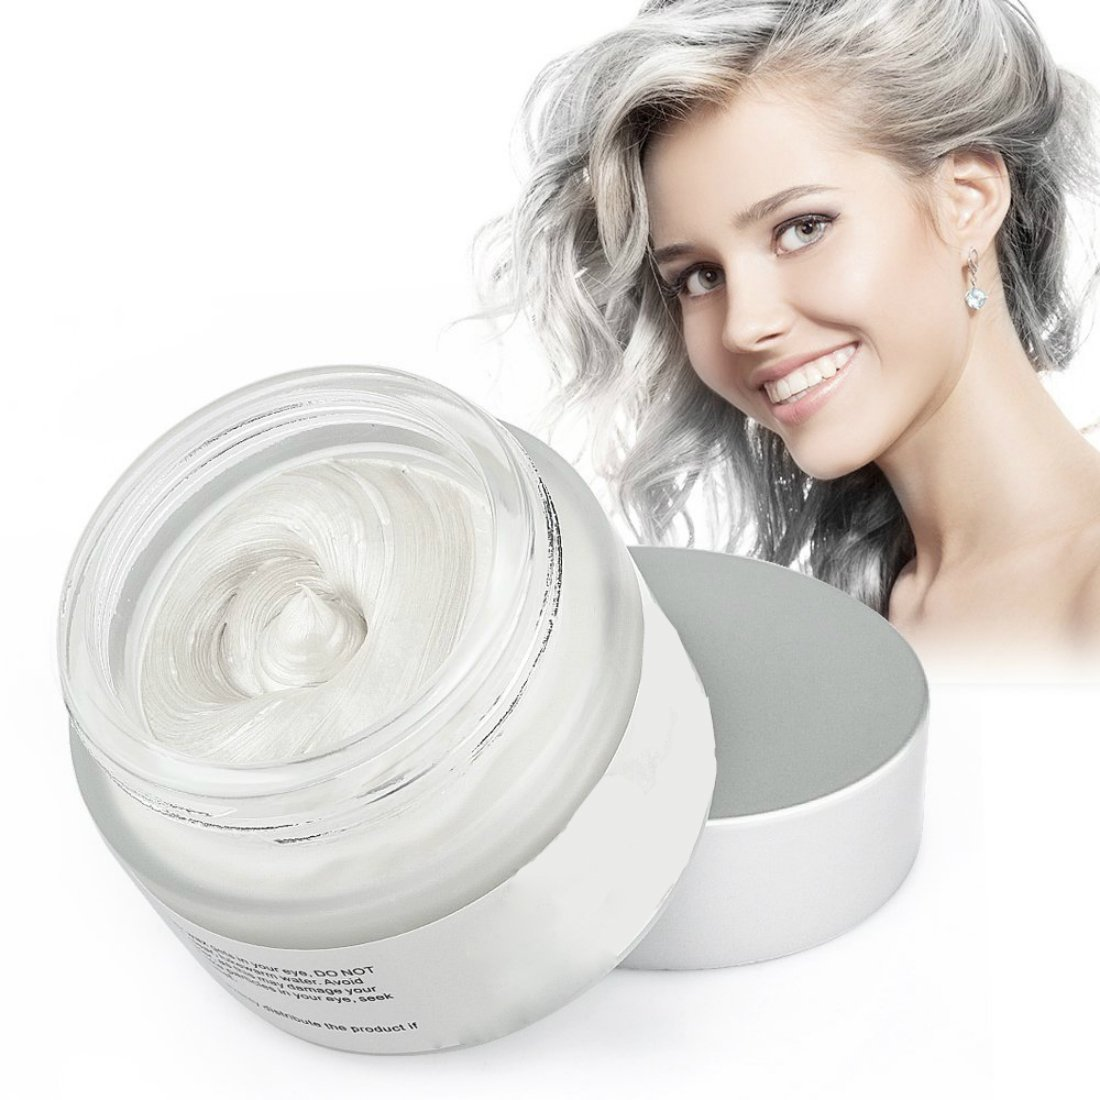 Mofajang Hair Wax Dye Styling Cream Mud, Natural Hairstyle Color Pomade, Washable Temporary (White) by MOFAJANG